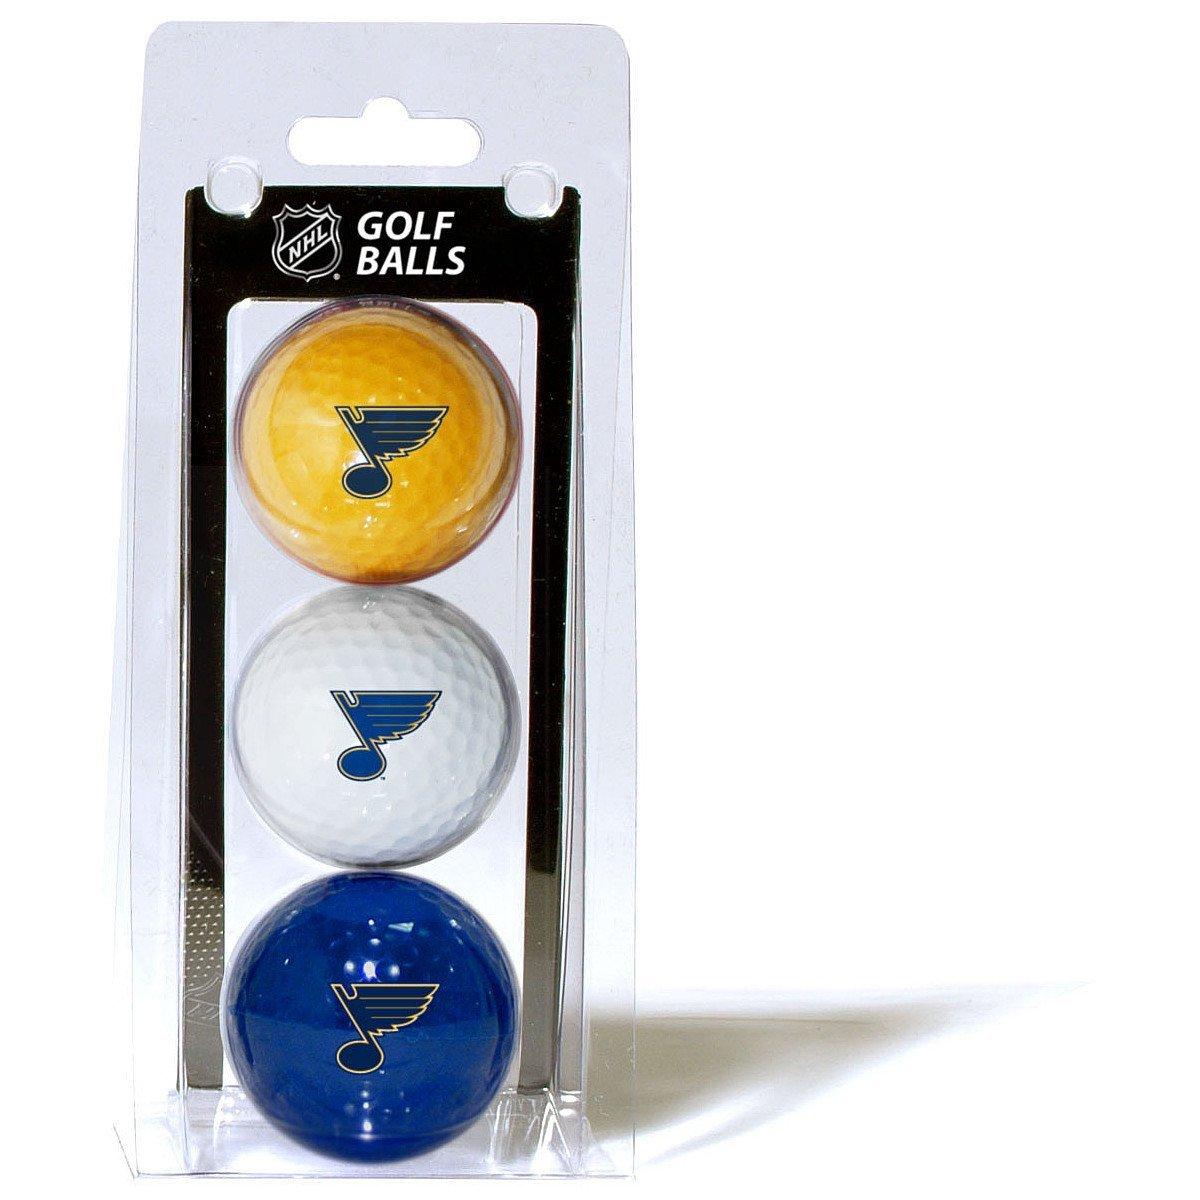 USA Wholesaler - TGO-15405 - St. Louis Blues NHL 3 Ball Pack